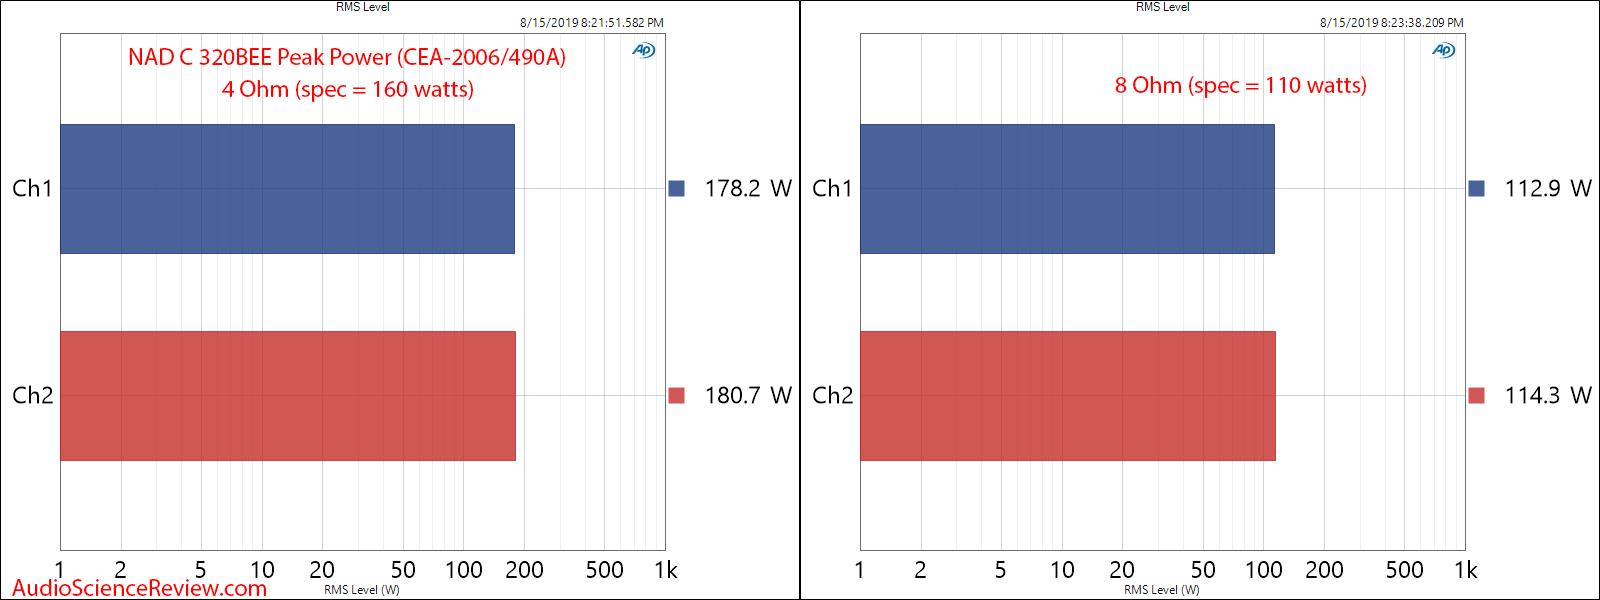 NAD C 320BEE Integrated Amplifier Peak Power Audio Measurements.png